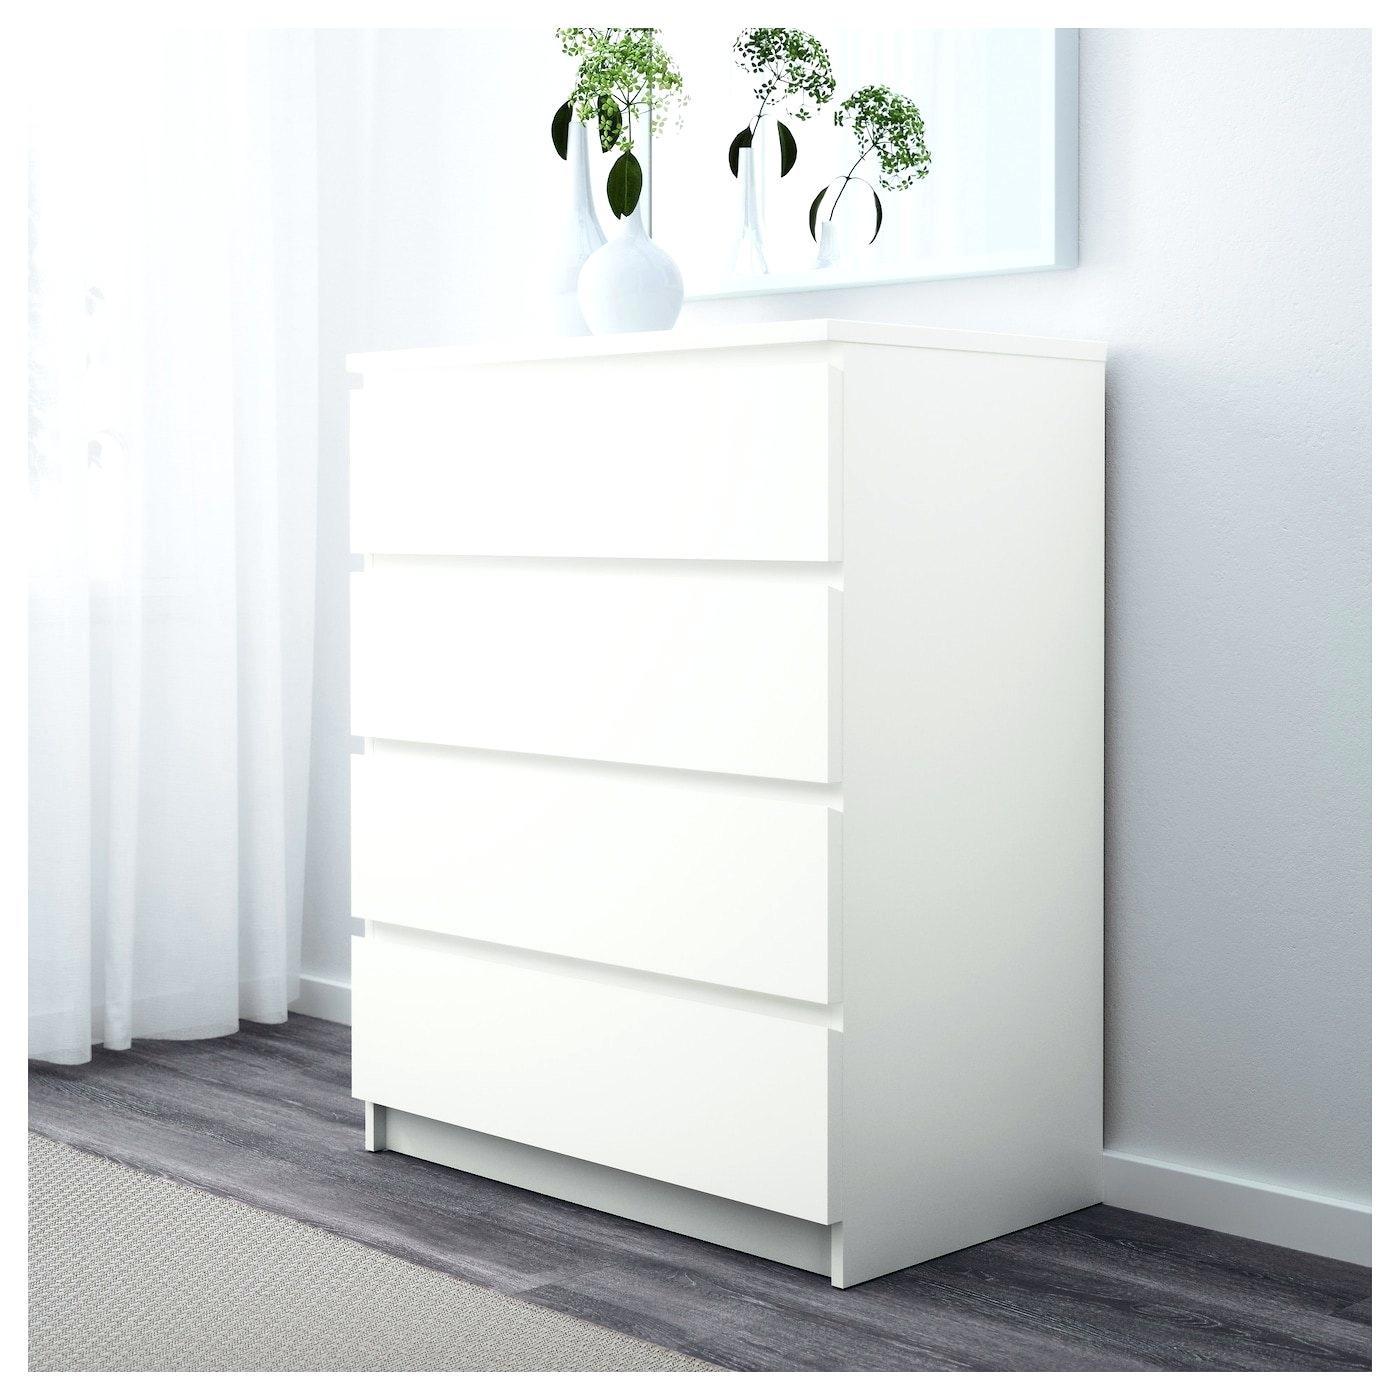 Ikea Malm Kommode Birke  Kommode Birke Amazing Related Post With Kommode Birke